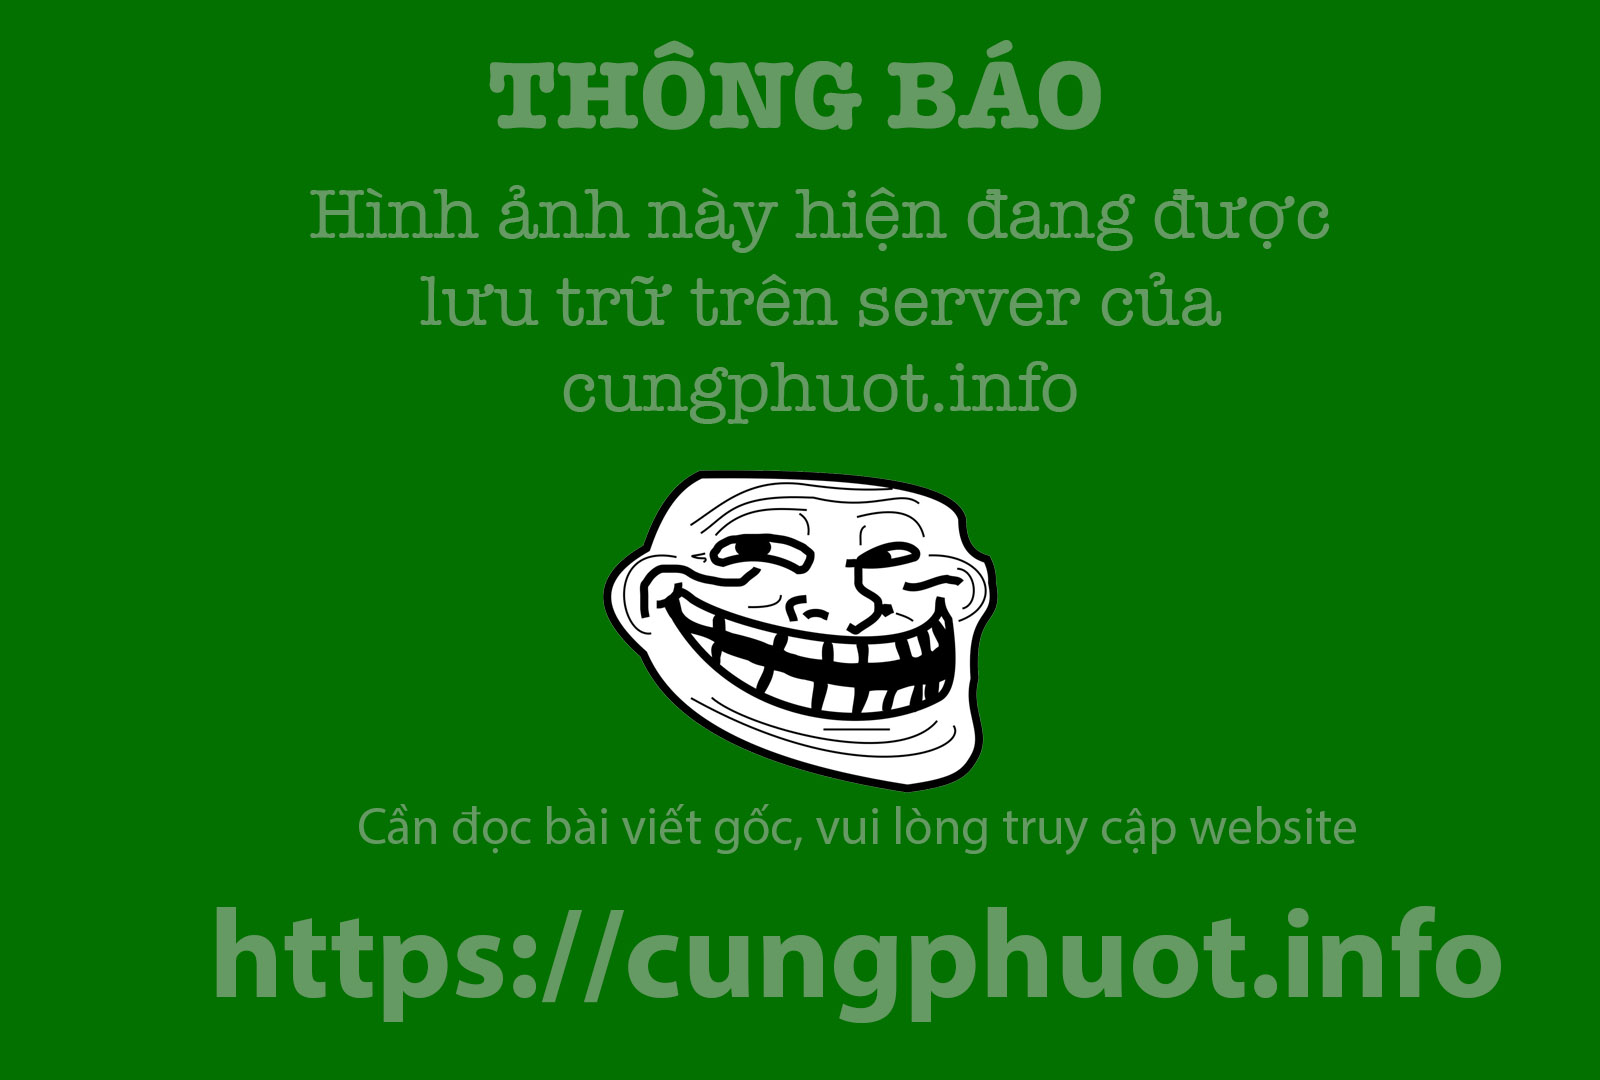 Co do Lam Kinh nhin tu tren cao hinh anh 9